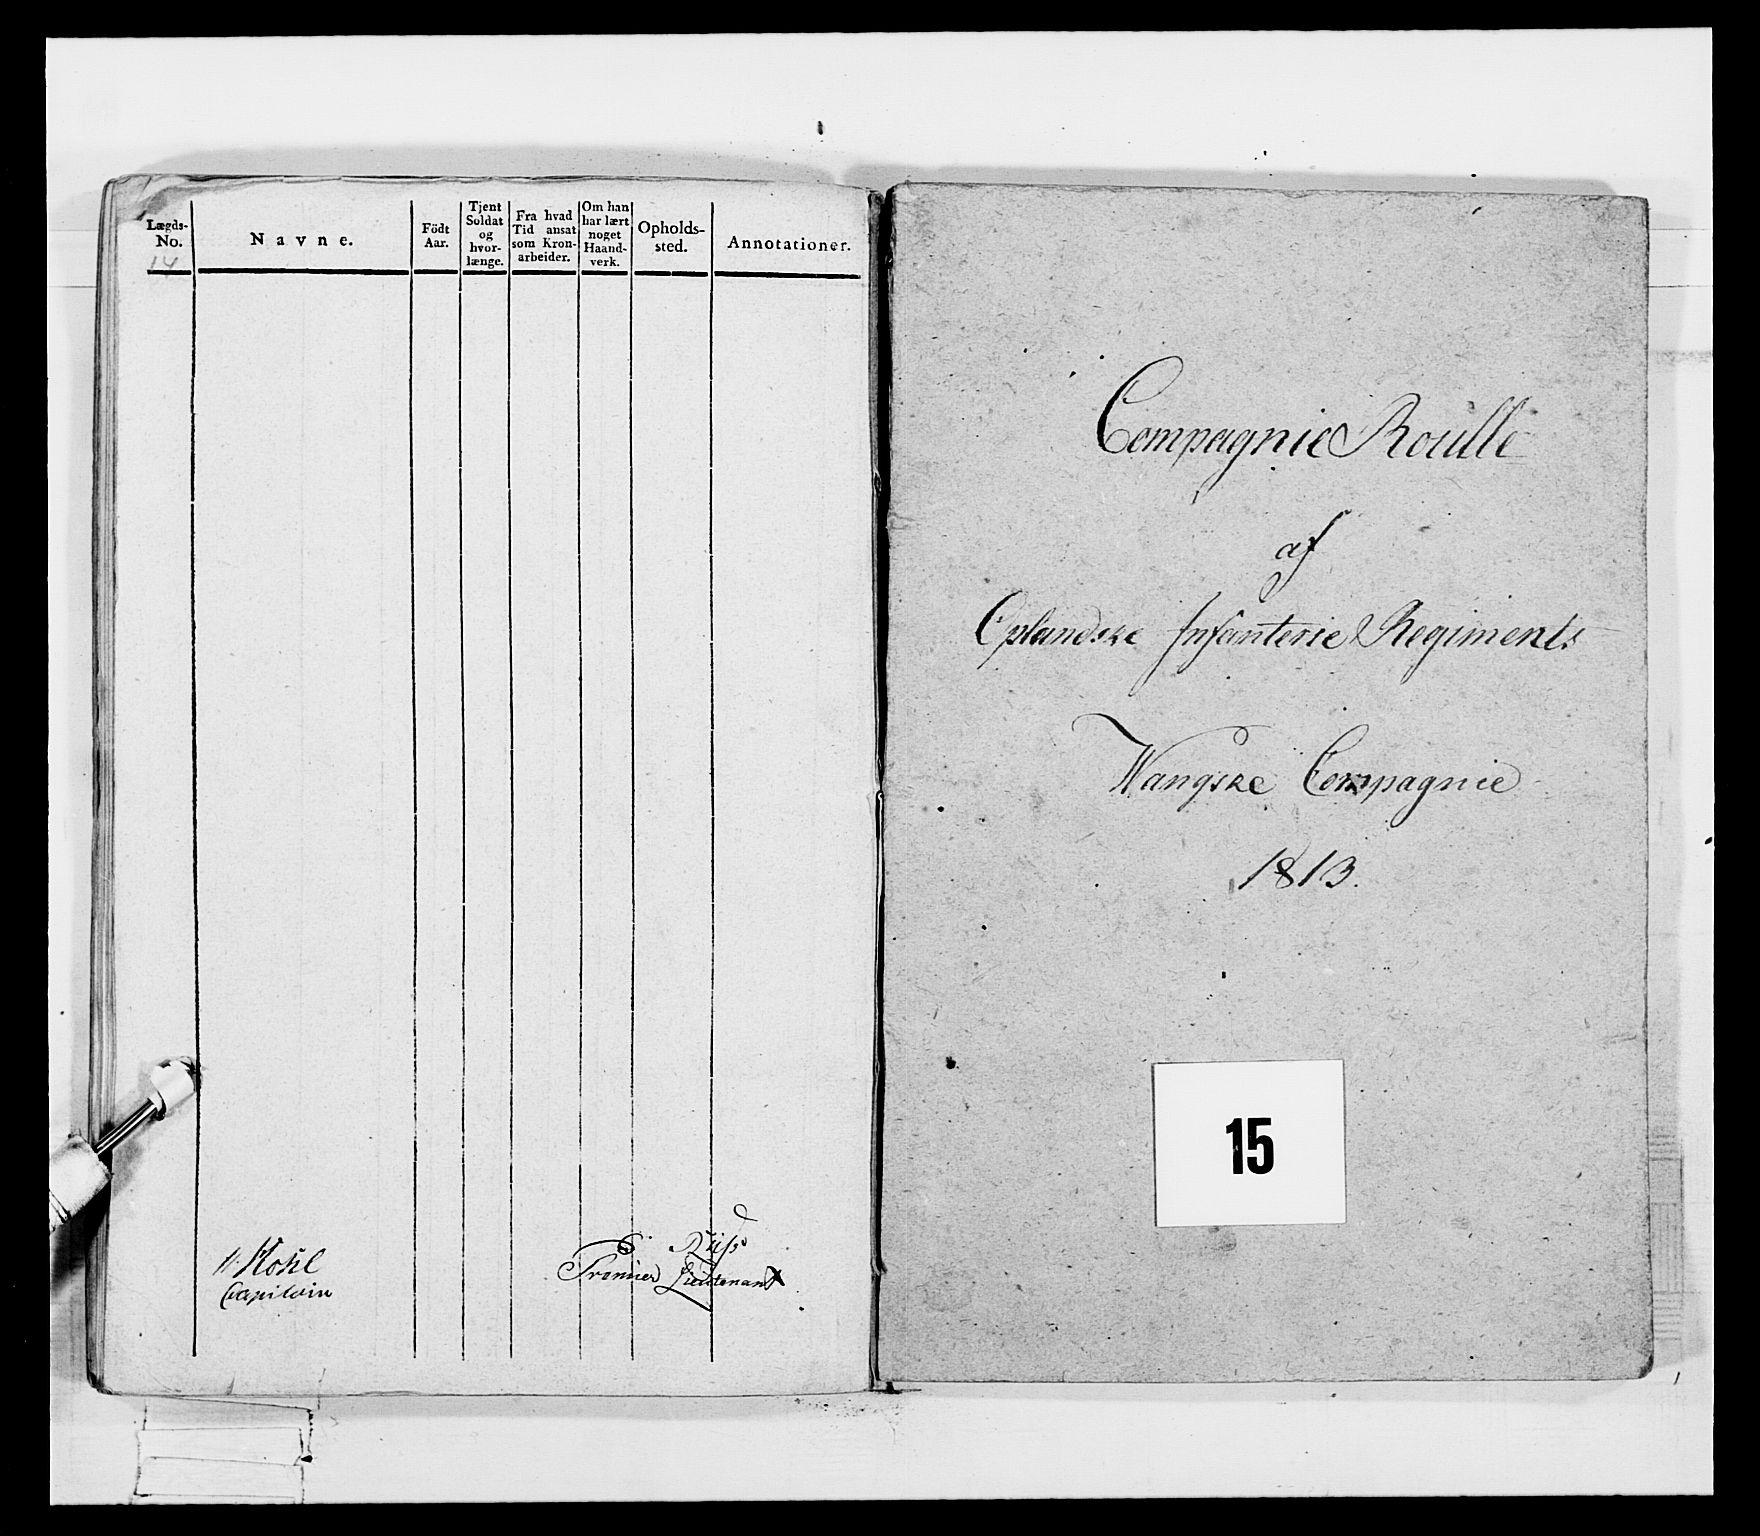 RA, Generalitets- og kommissariatskollegiet, Det kongelige norske kommissariatskollegium, E/Eh/L0069: Opplandske gevorbne infanteriregiment, 1810-1818, s. 714